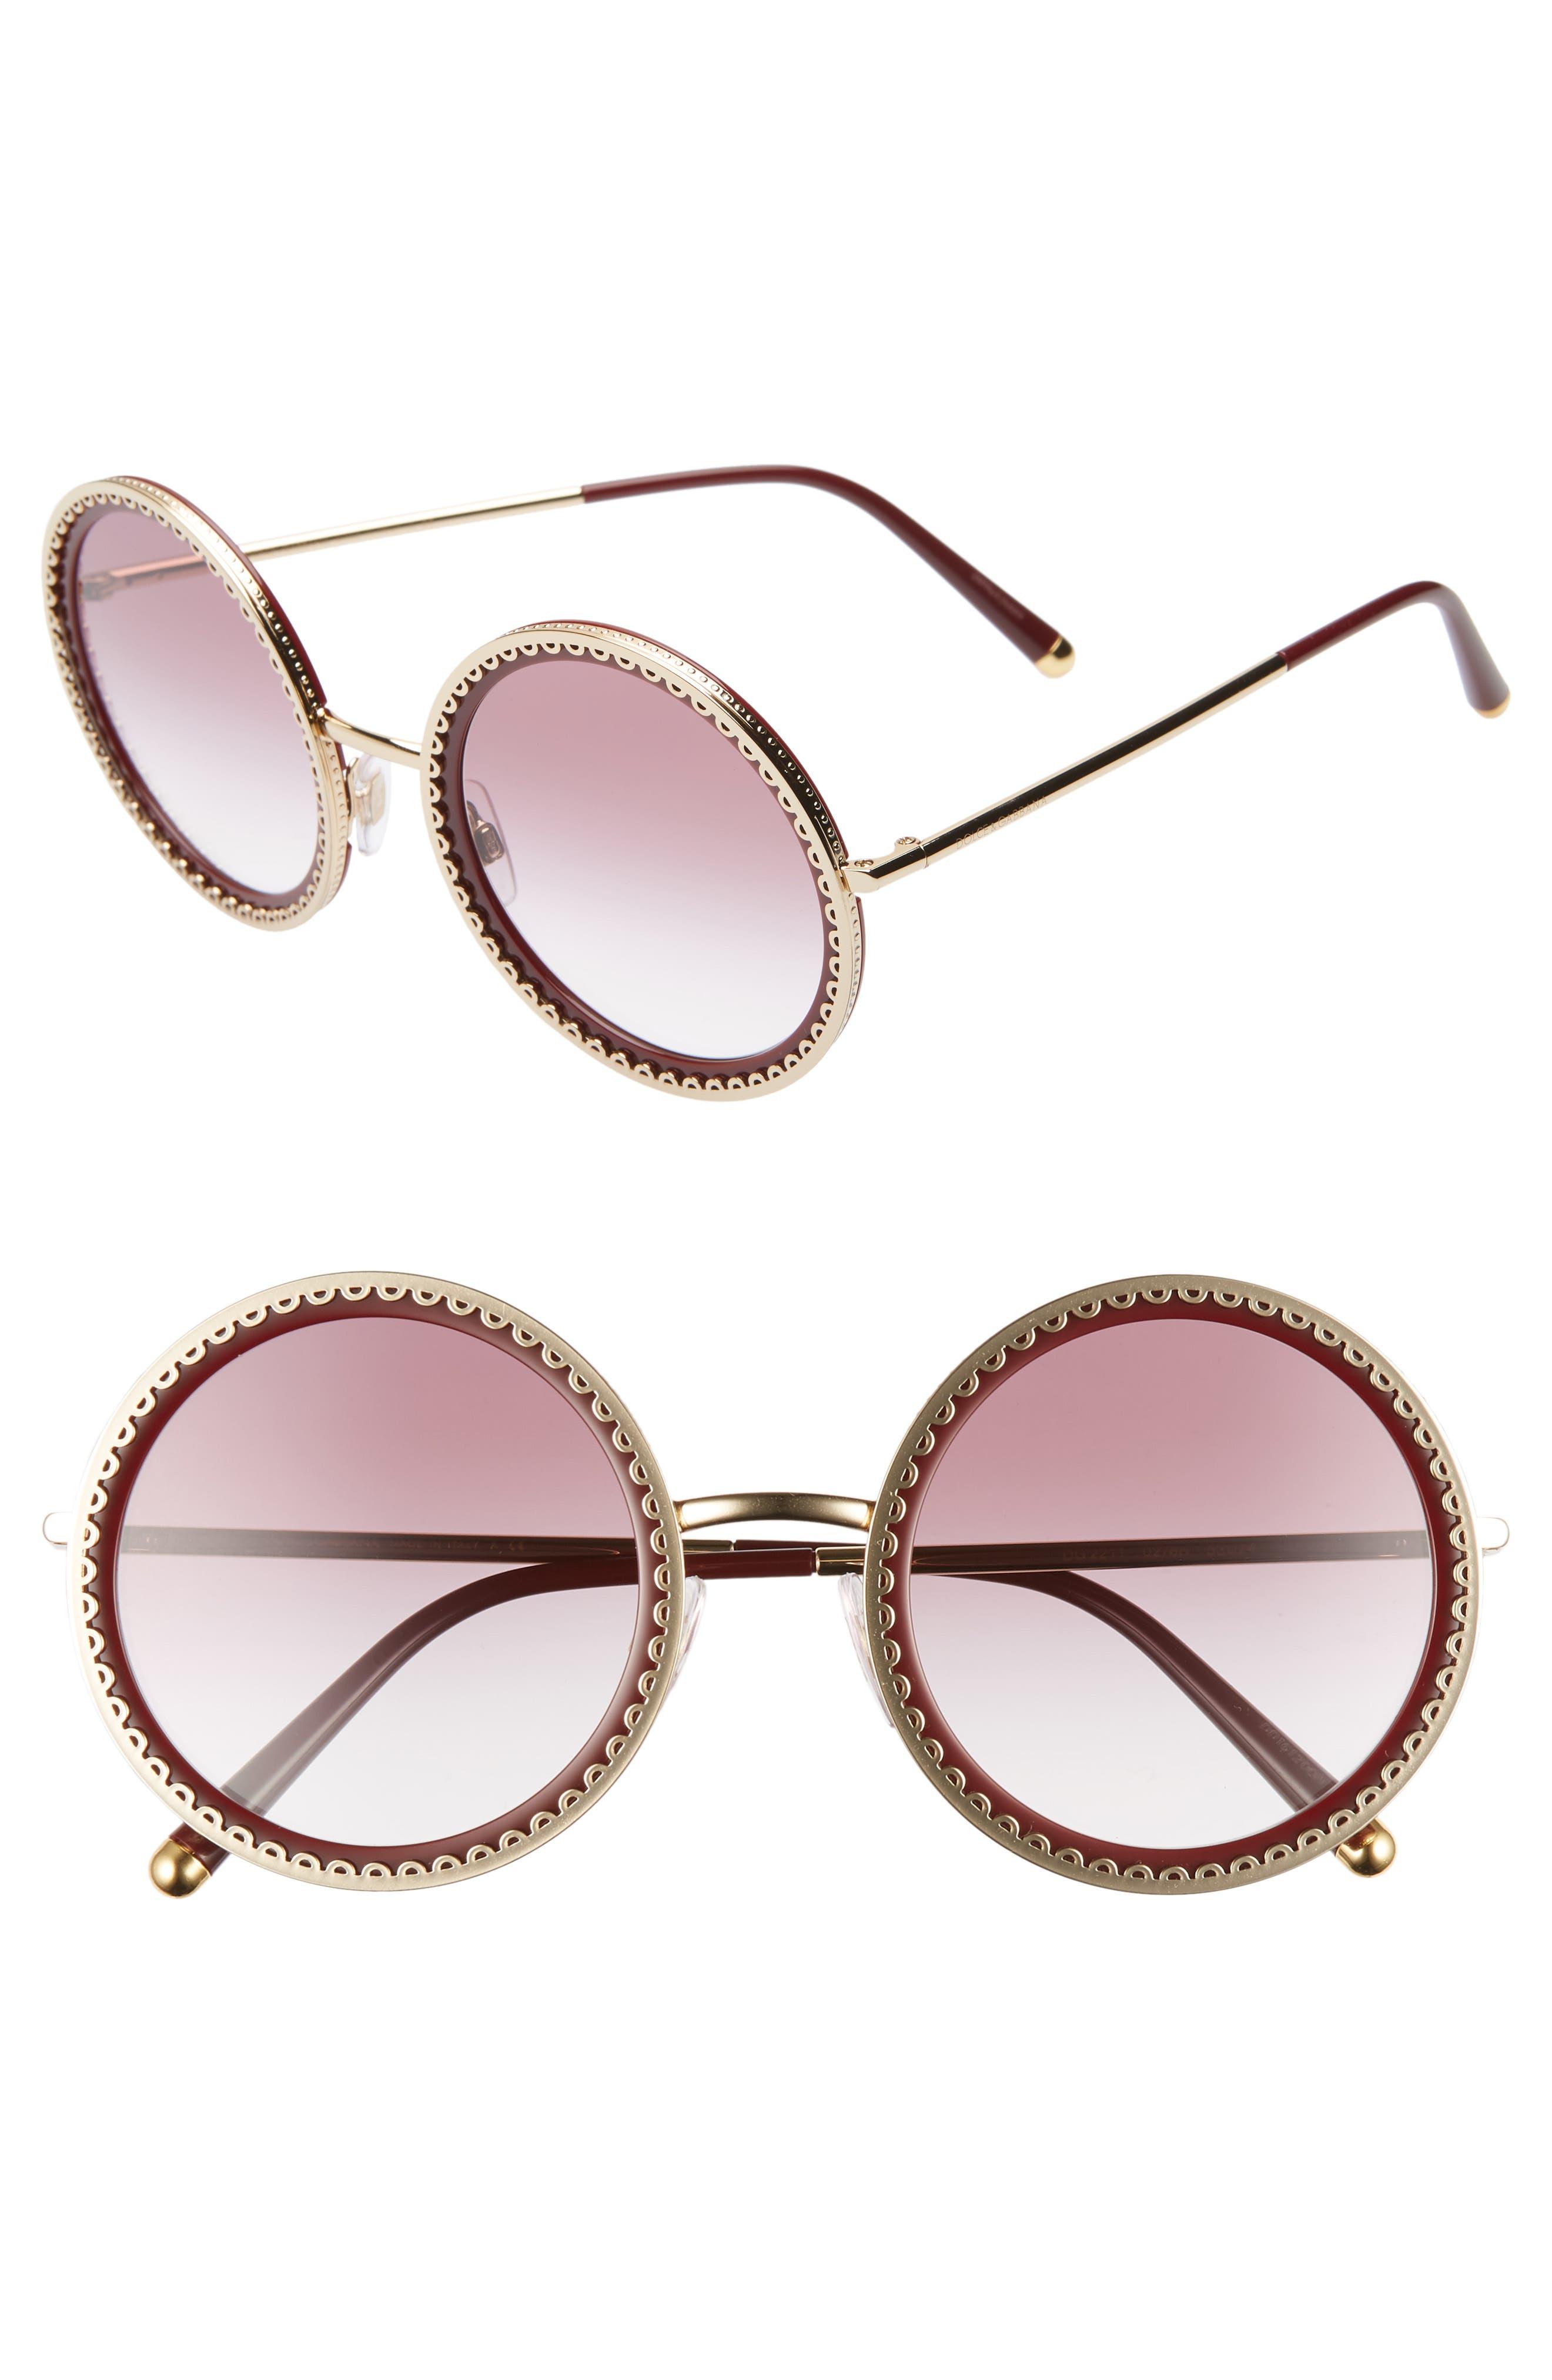 0db5a783023 Dolce   Gabbana Women s Accessories